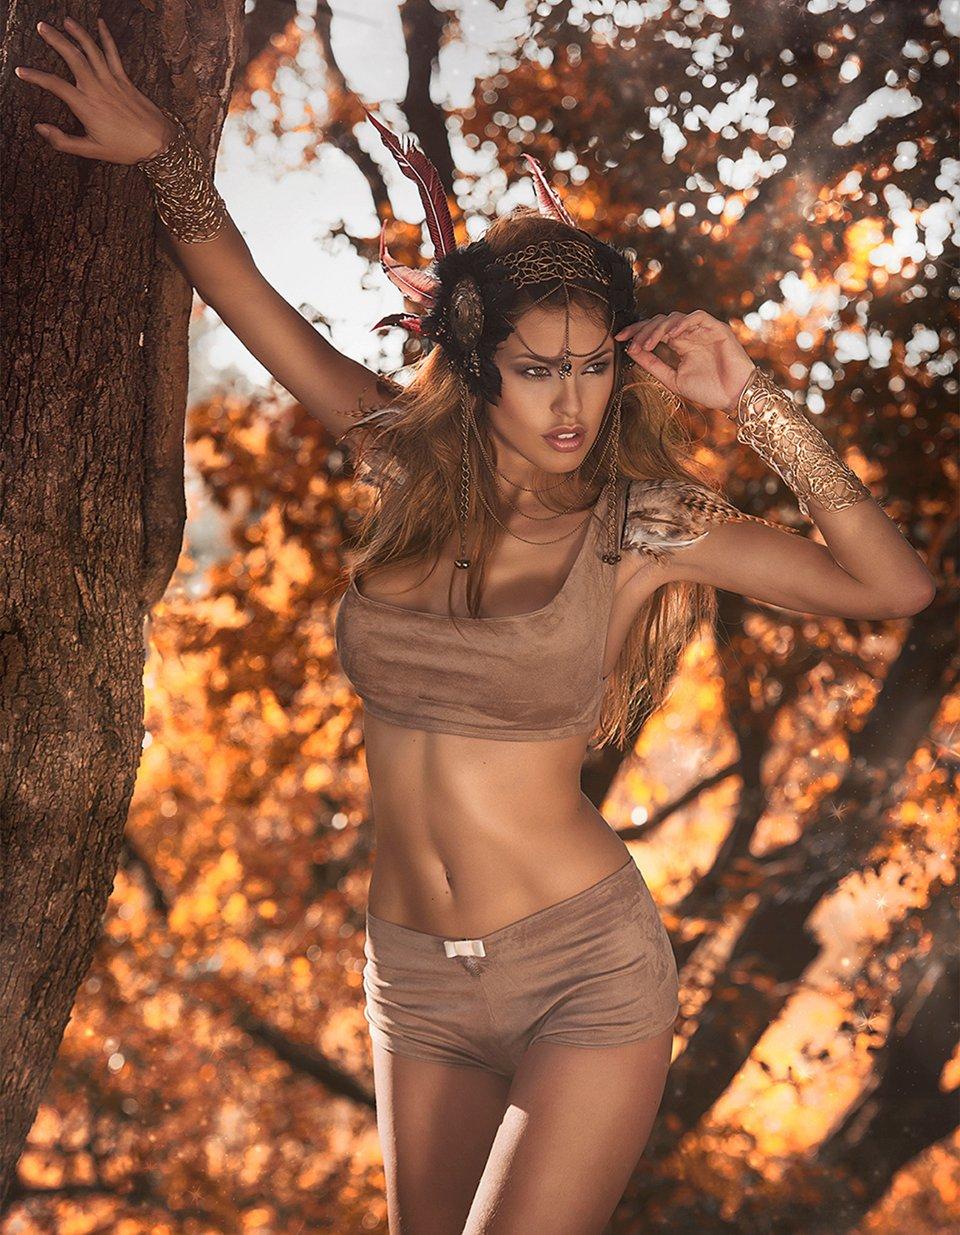 sylvio testa photographe lingerie